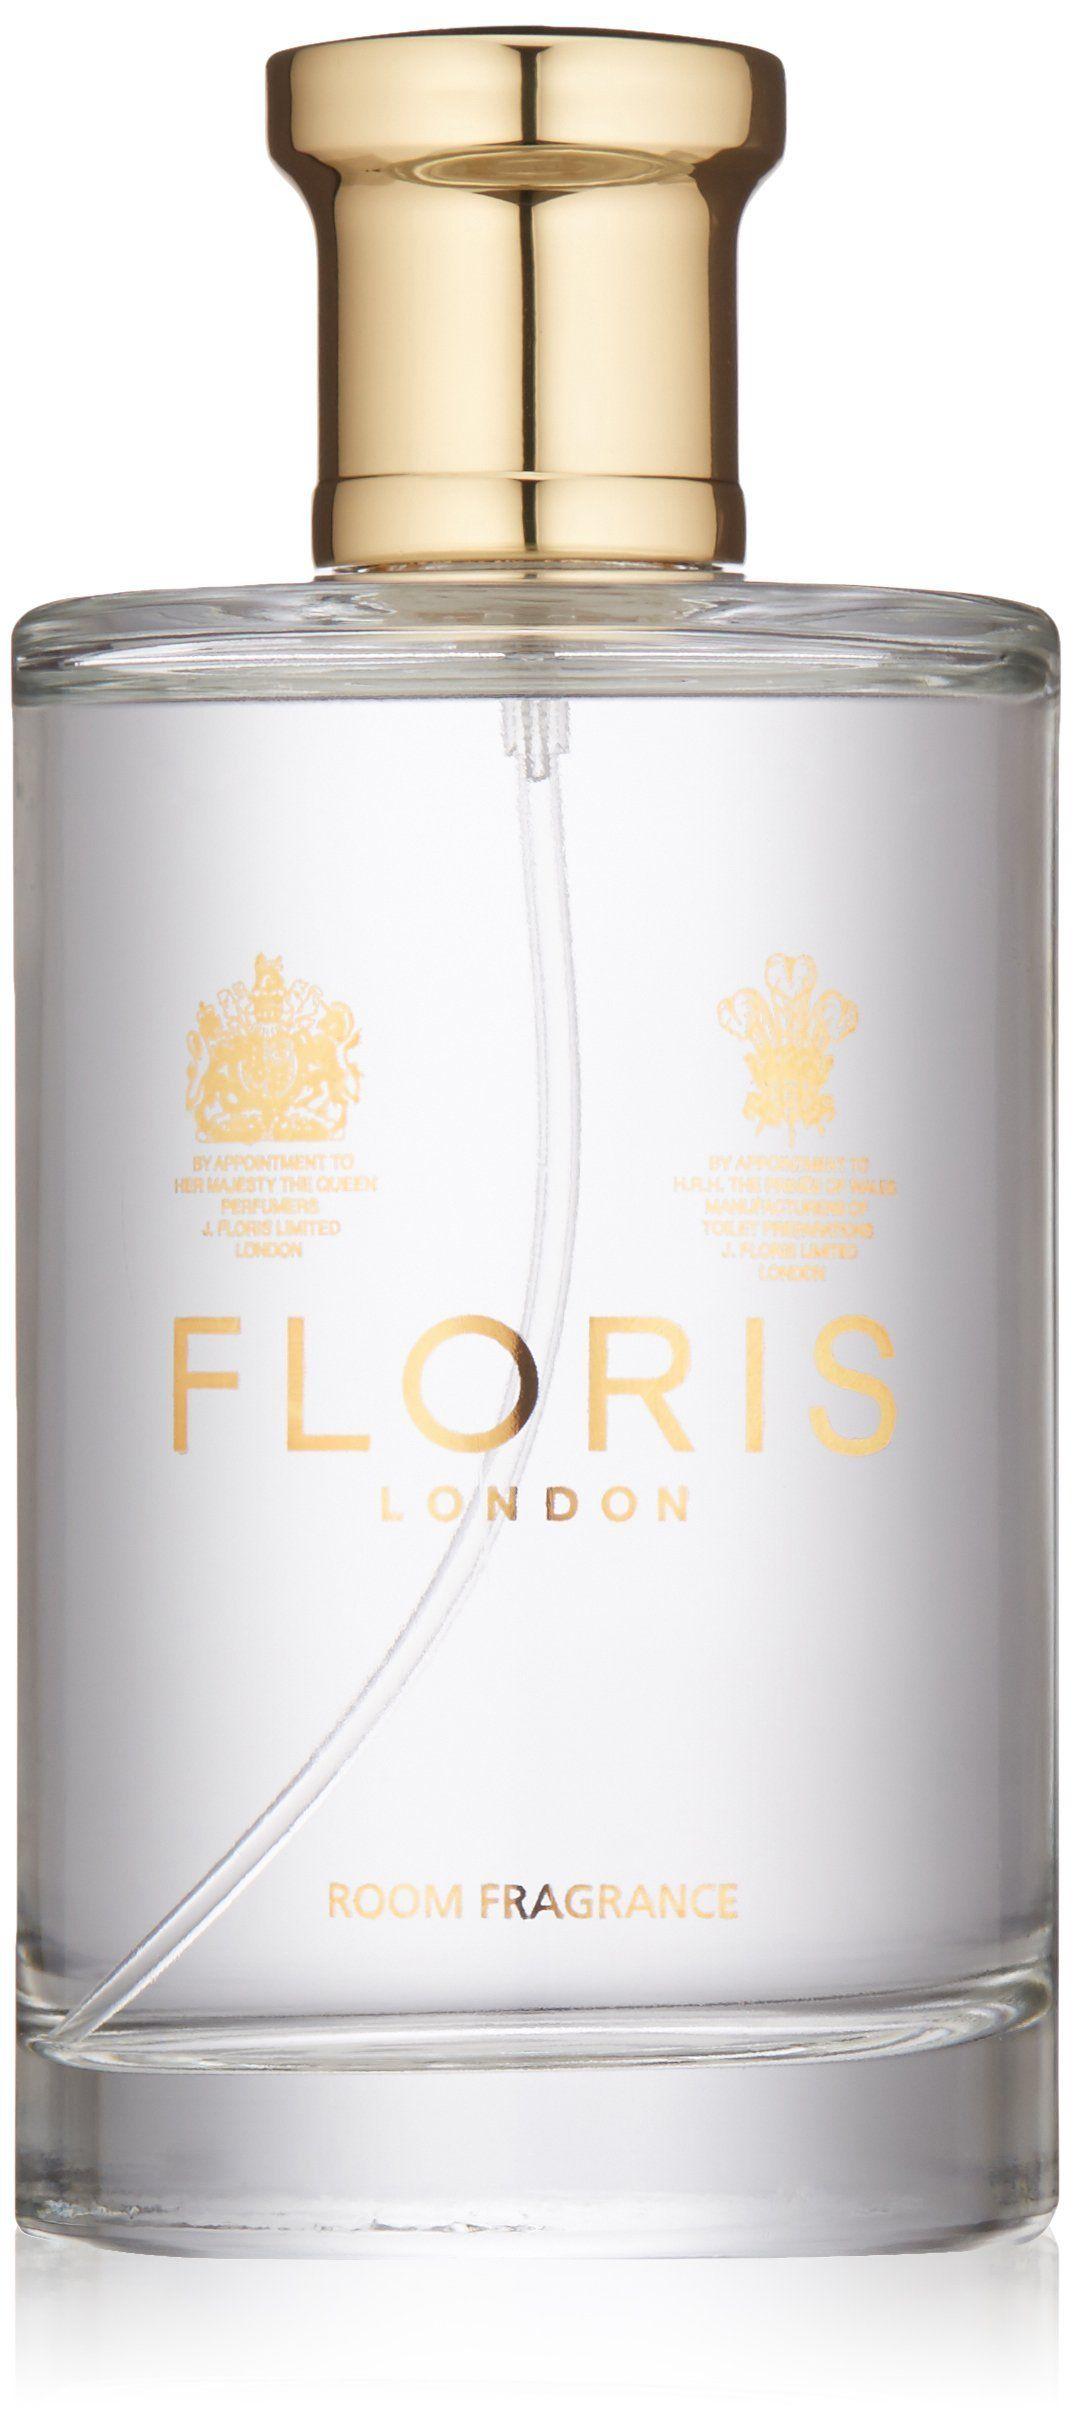 Floris london lavender mint room fragrance 34 fl oz